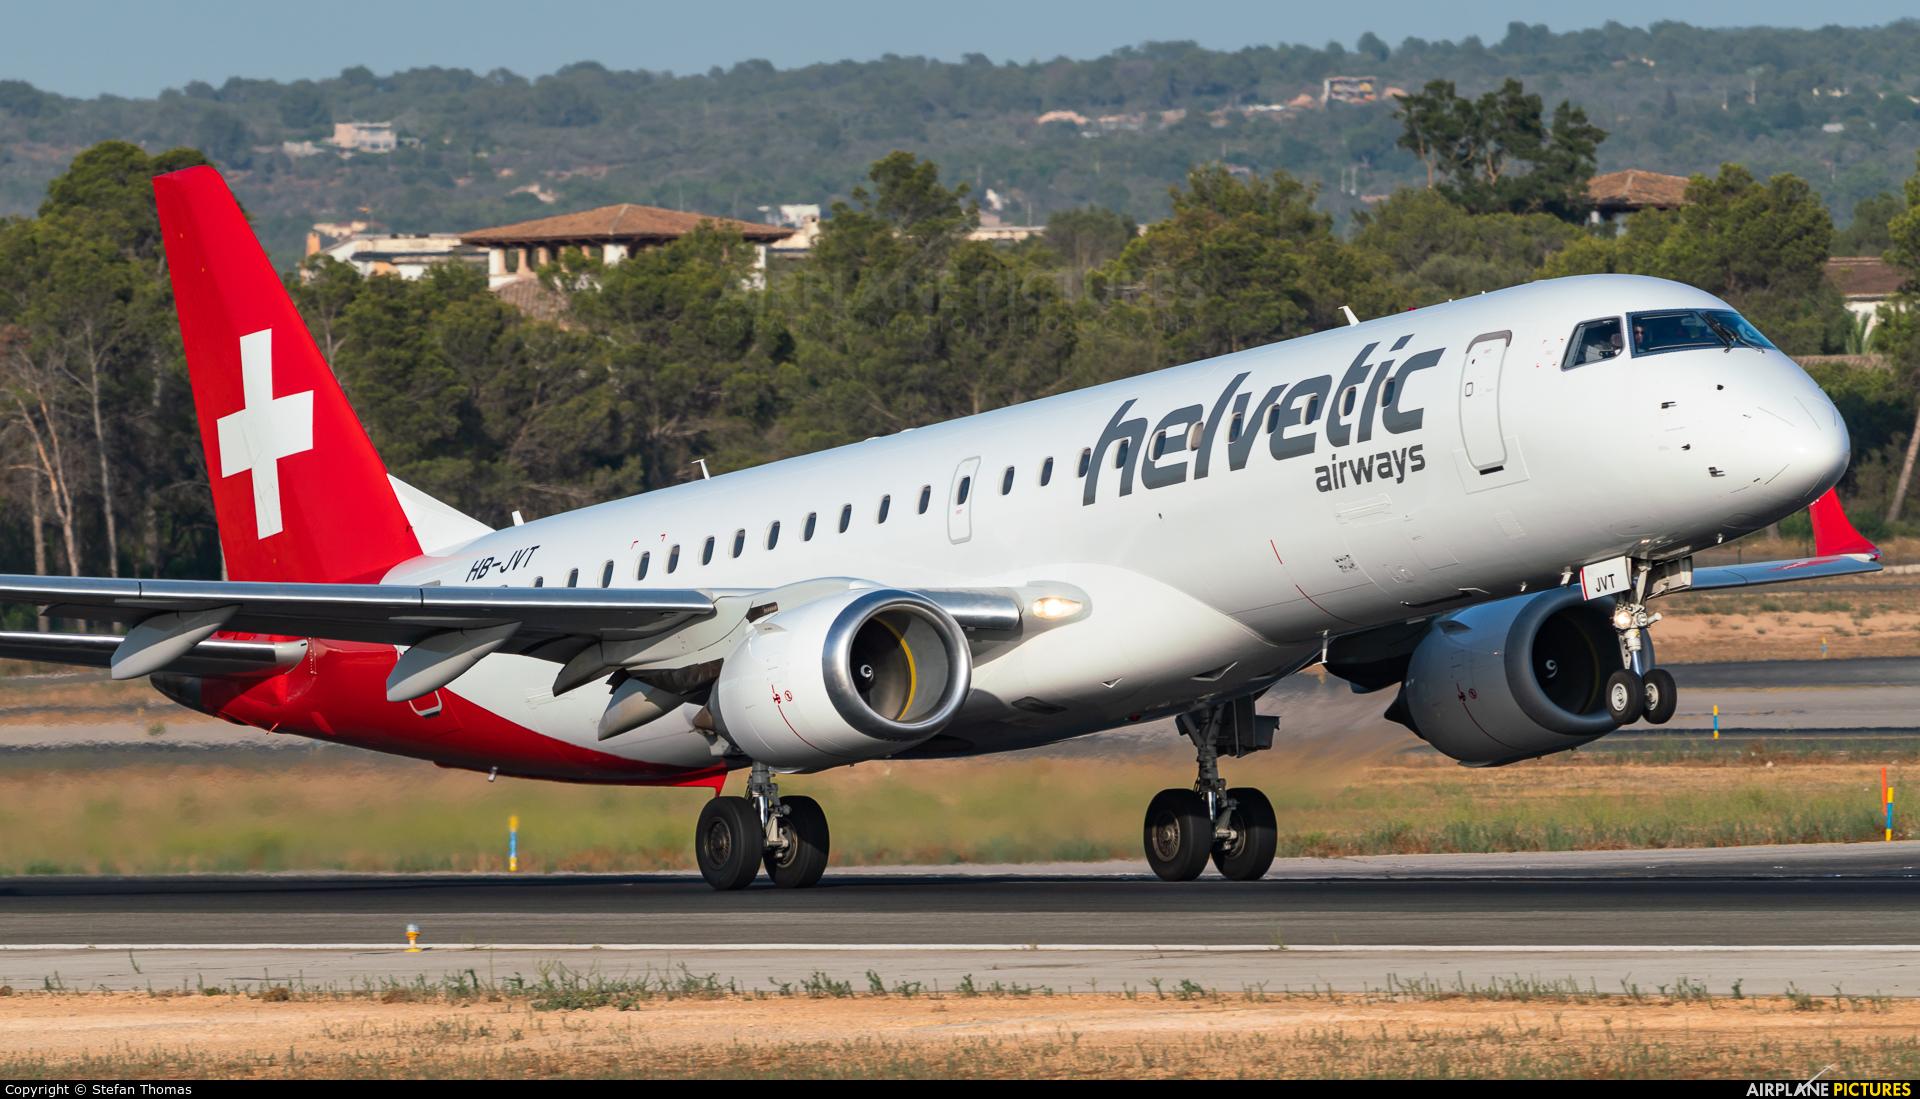 Helvetic Airways HB-JVT aircraft at Palma de Mallorca